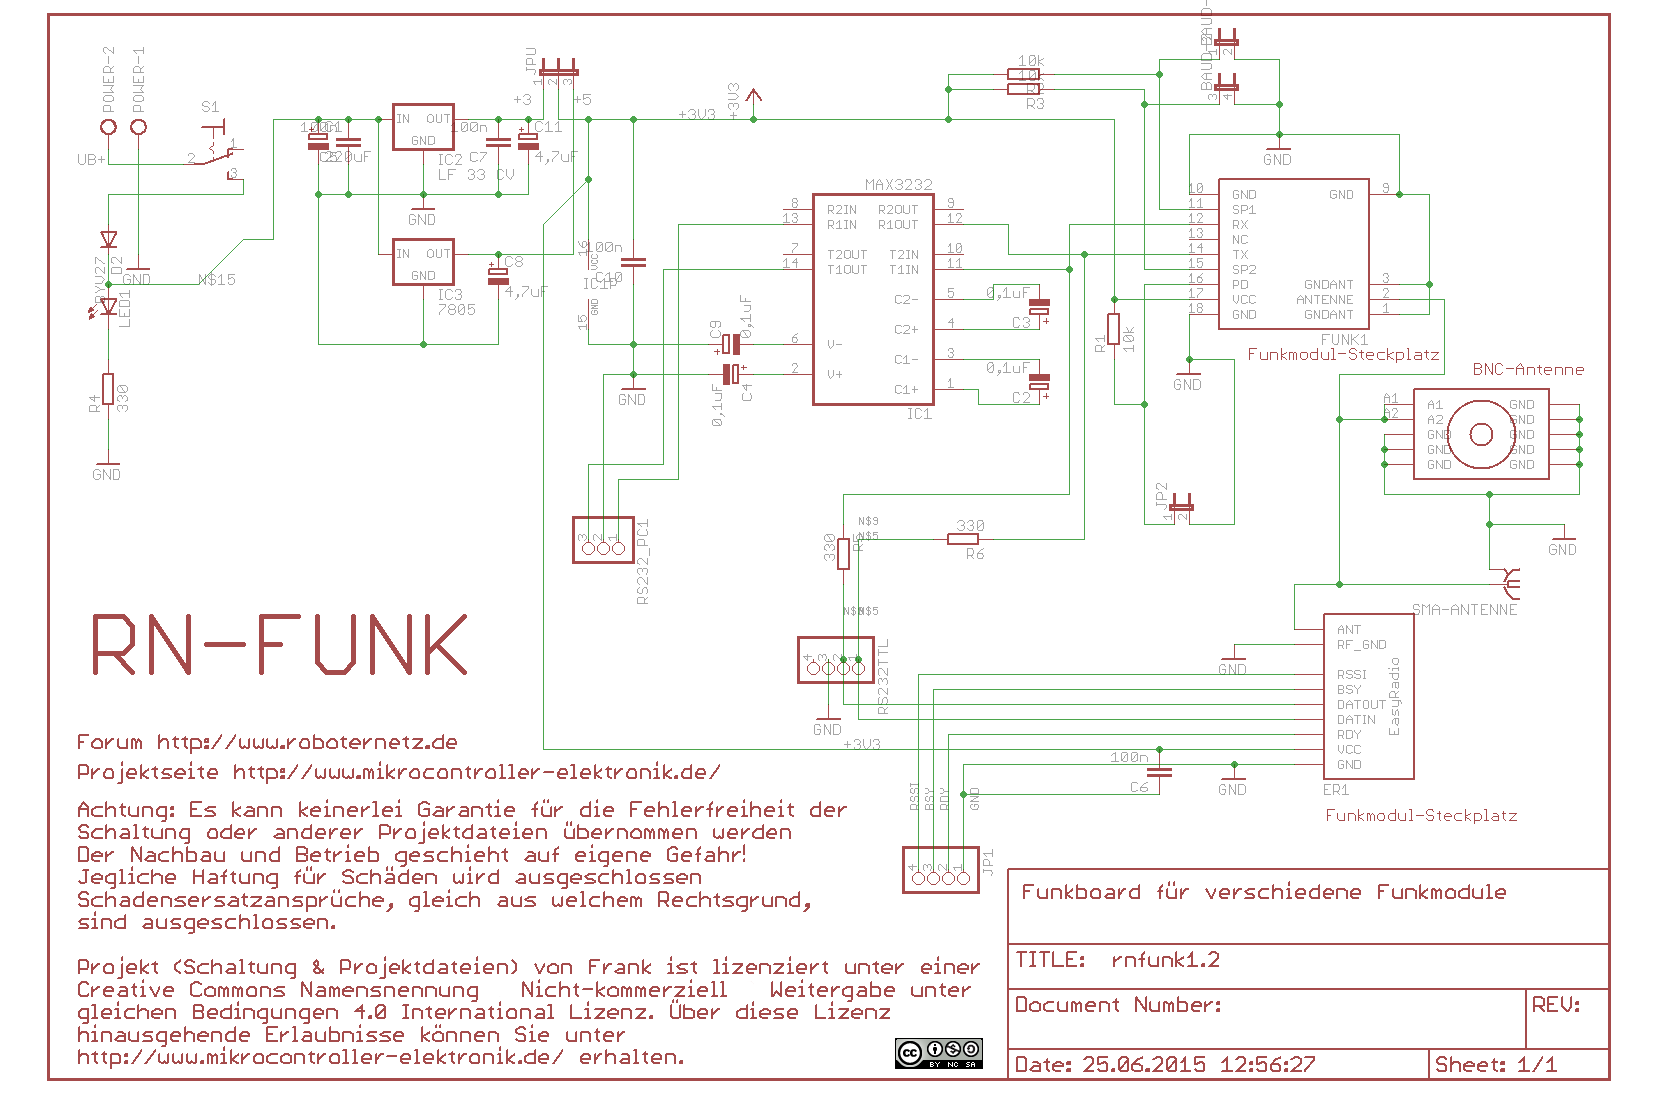 RN-Funk - Funkmodul nach RS232 Adapter